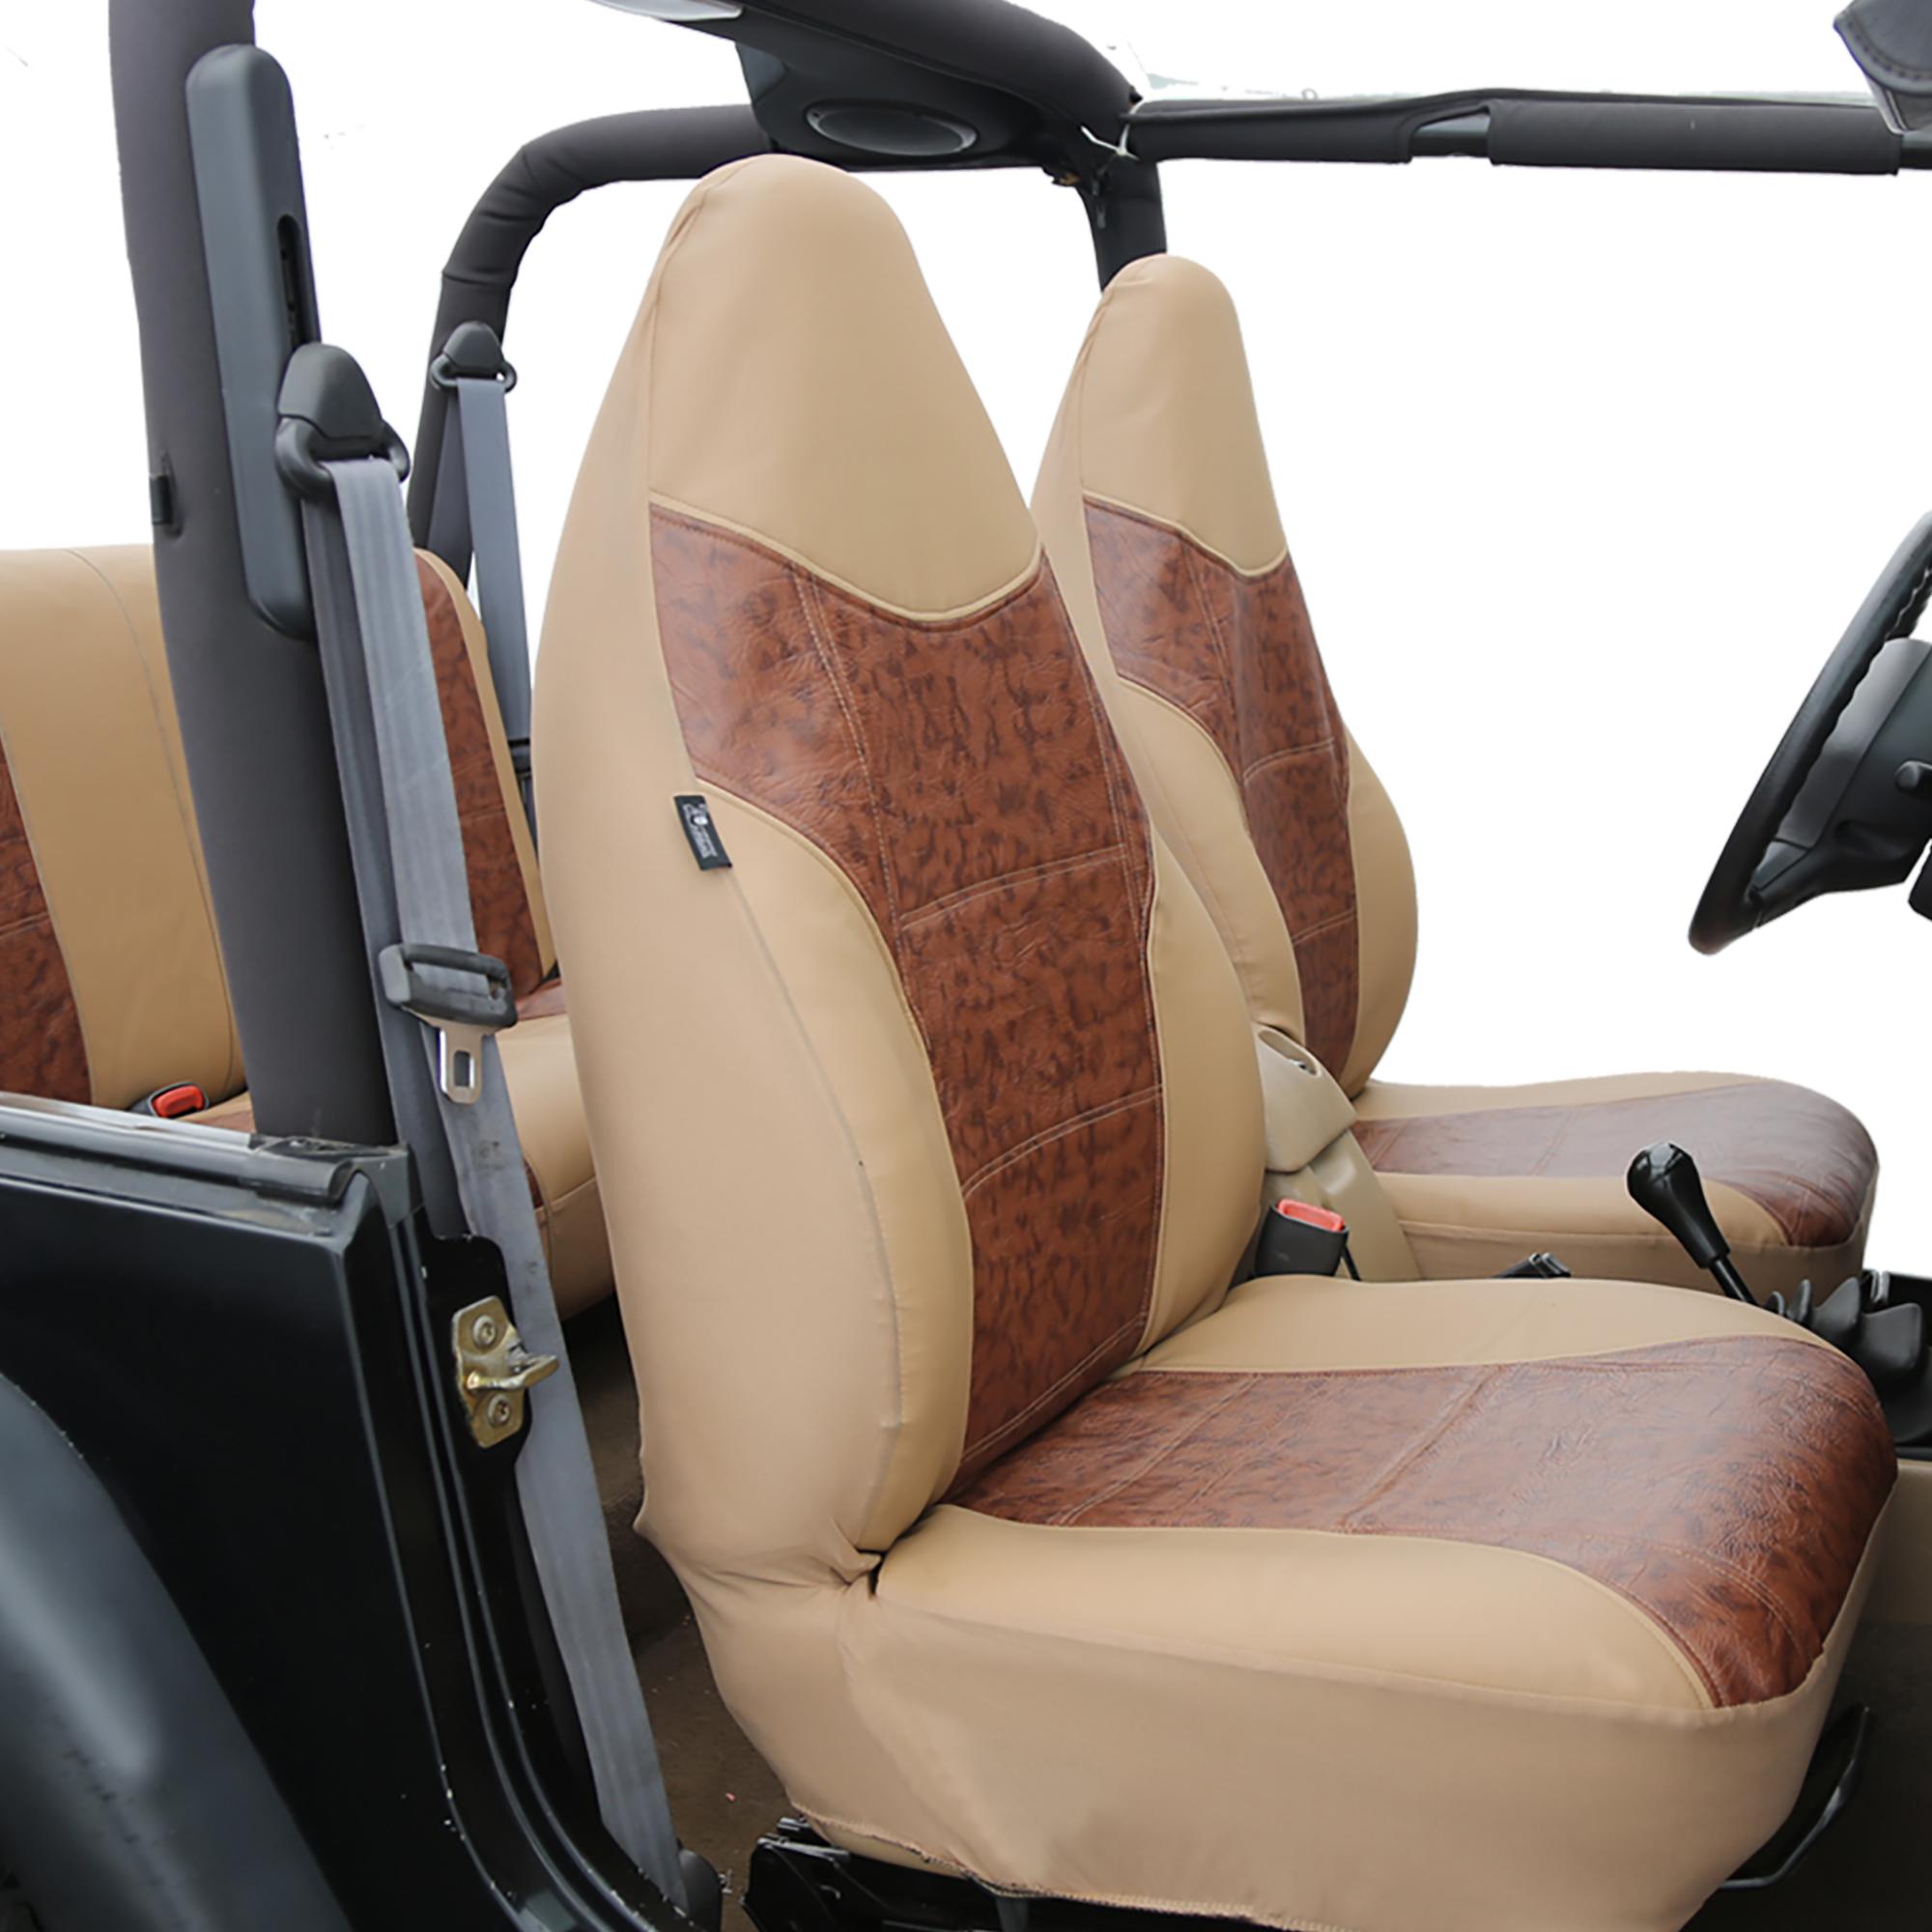 faux leather tan brown car seat cover set headrests floor mat set ebay. Black Bedroom Furniture Sets. Home Design Ideas